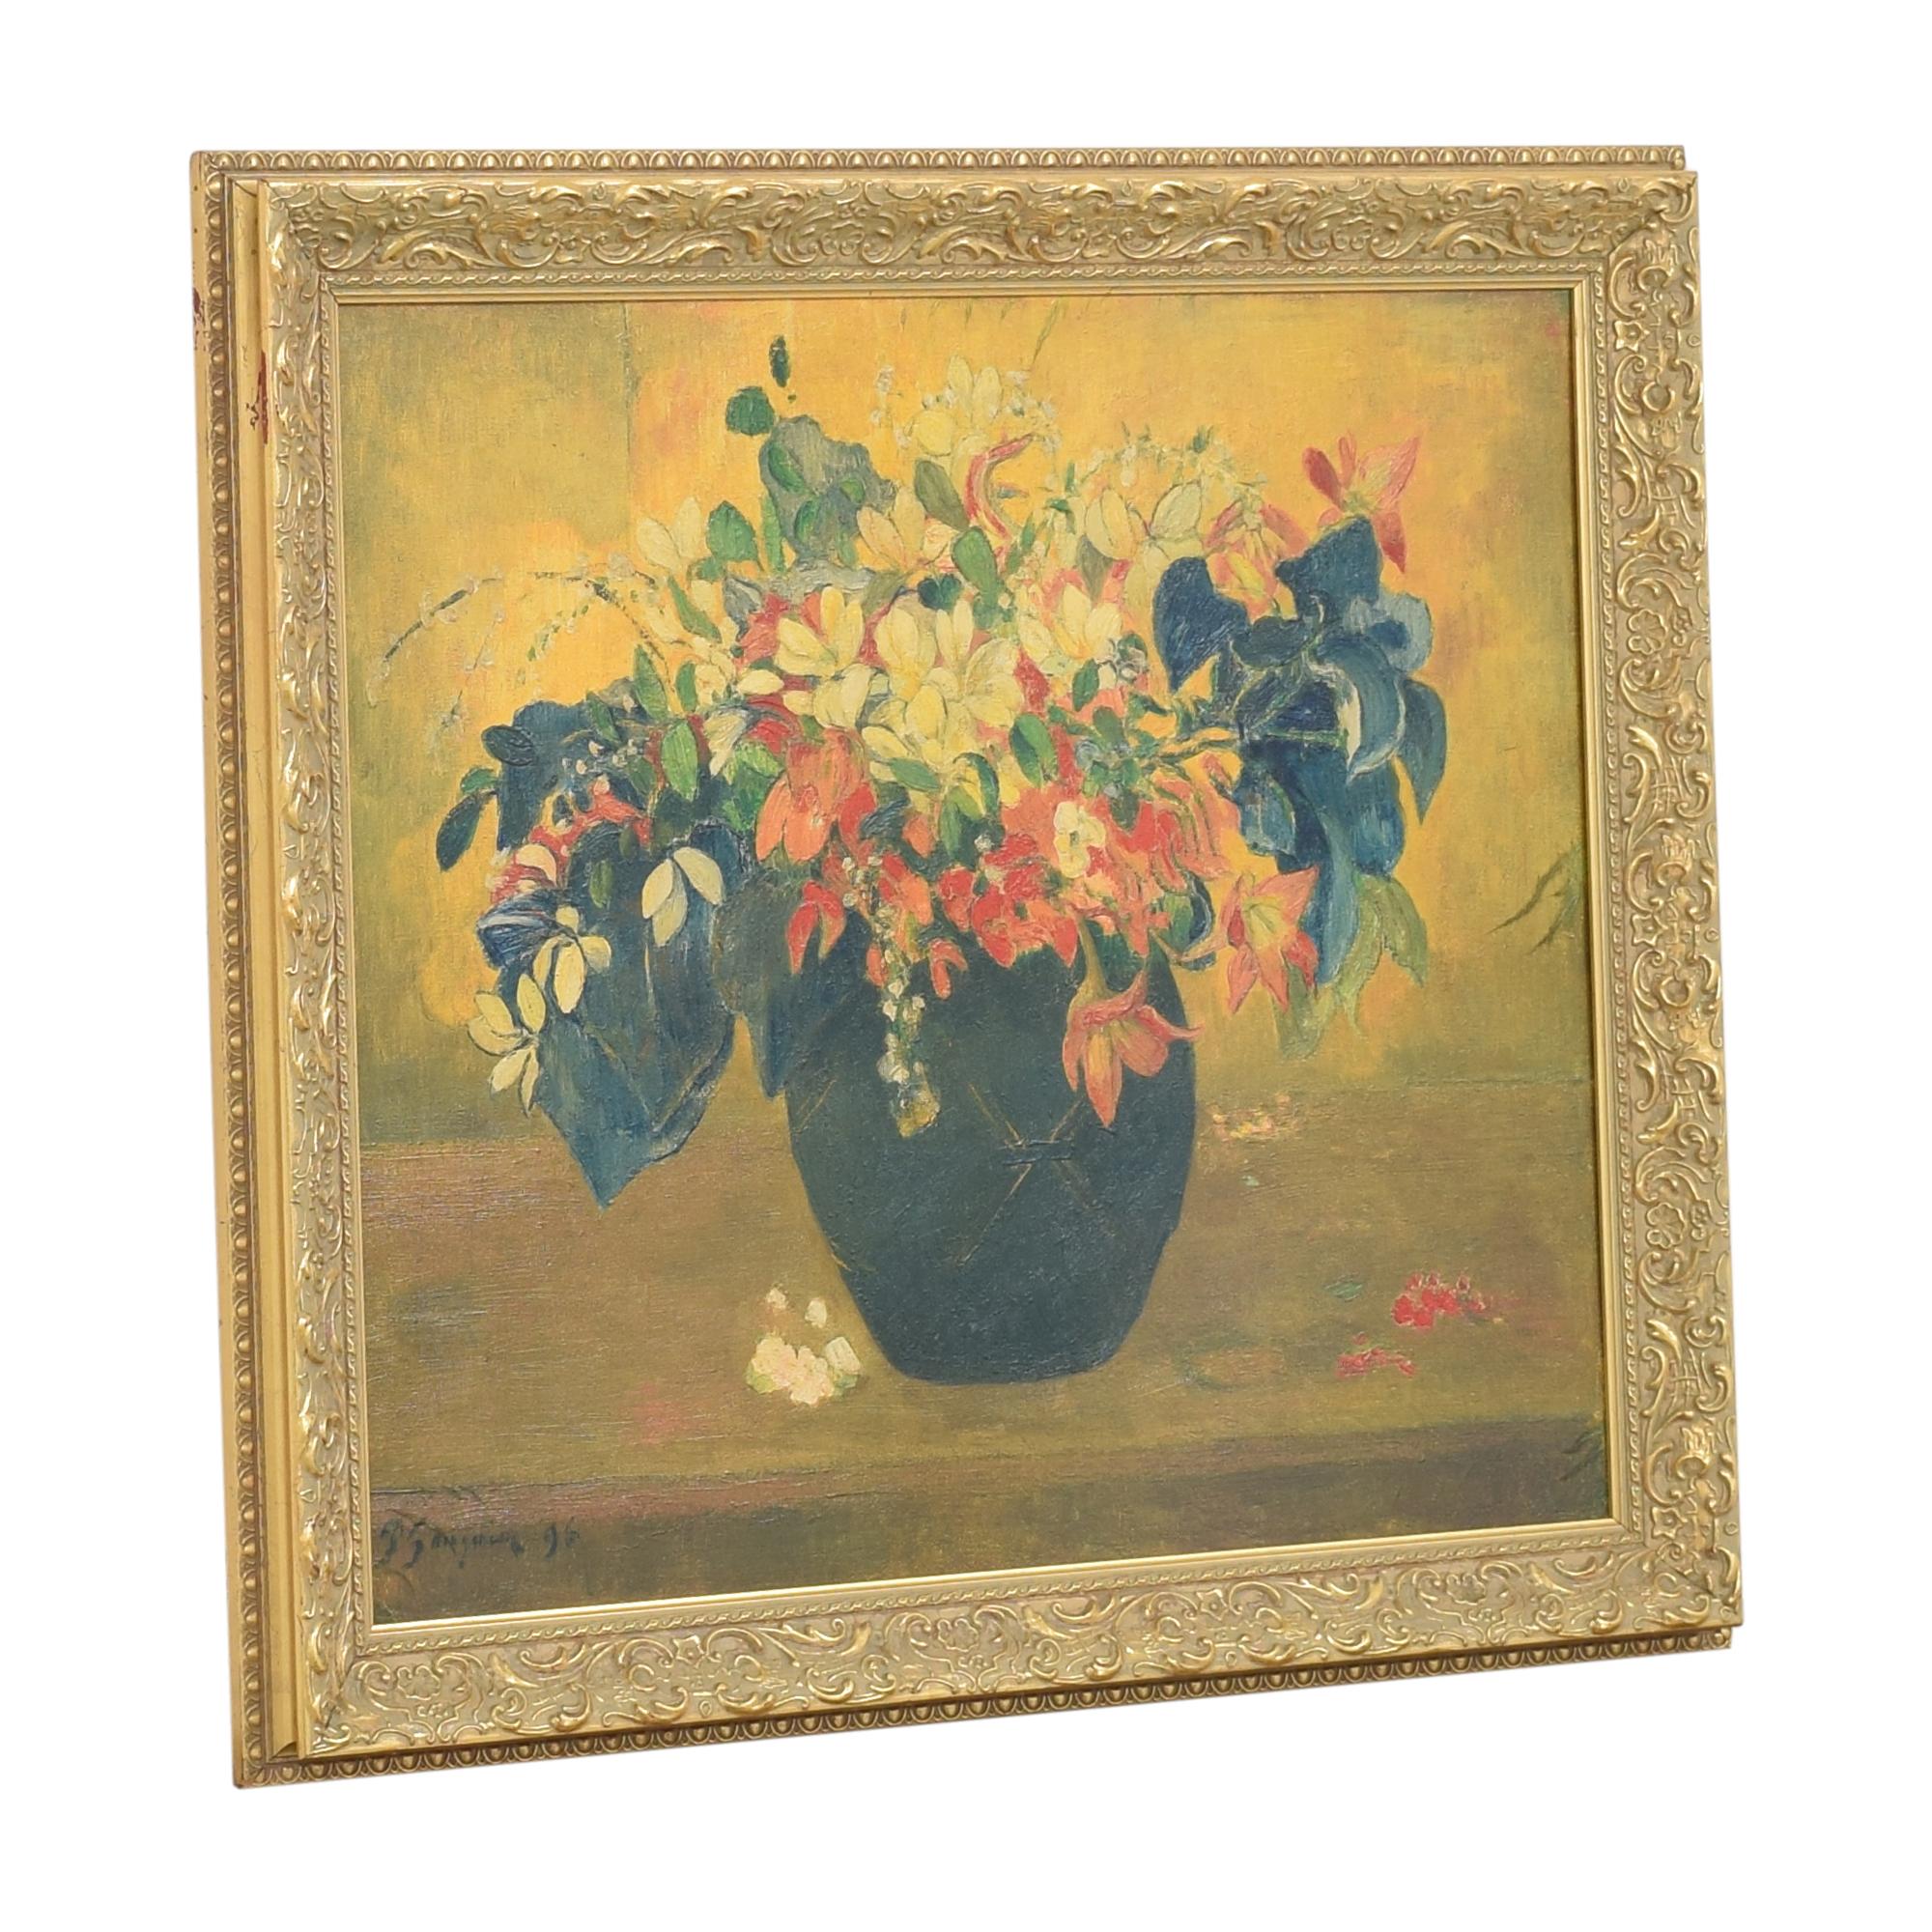 Gauguin Reproduction Wall Art nj